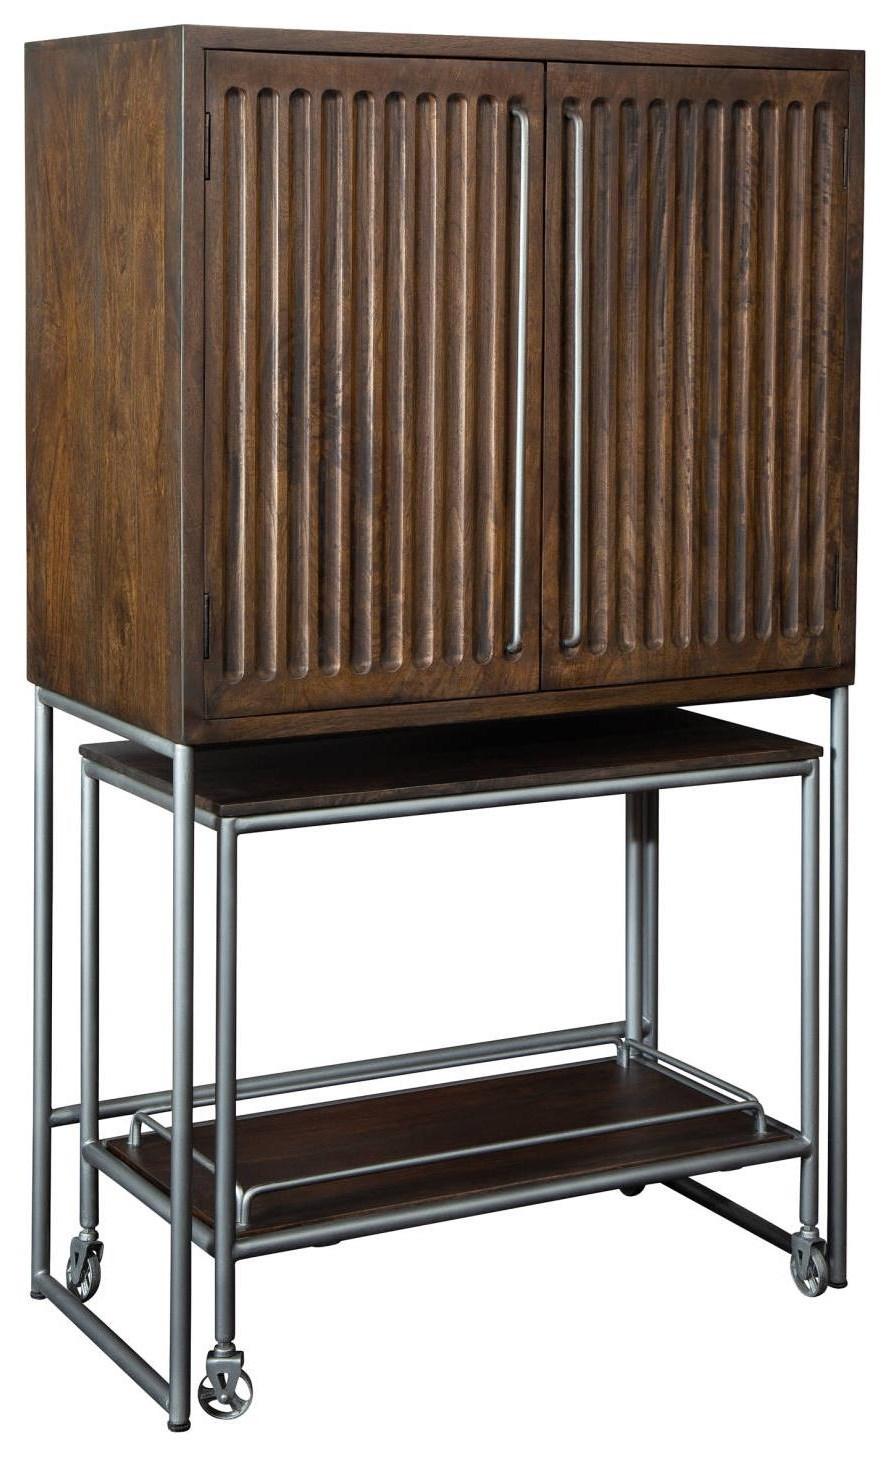 Wine & Bar Furnishings Bar & Wine Cabinet w/ Cart at Rotmans